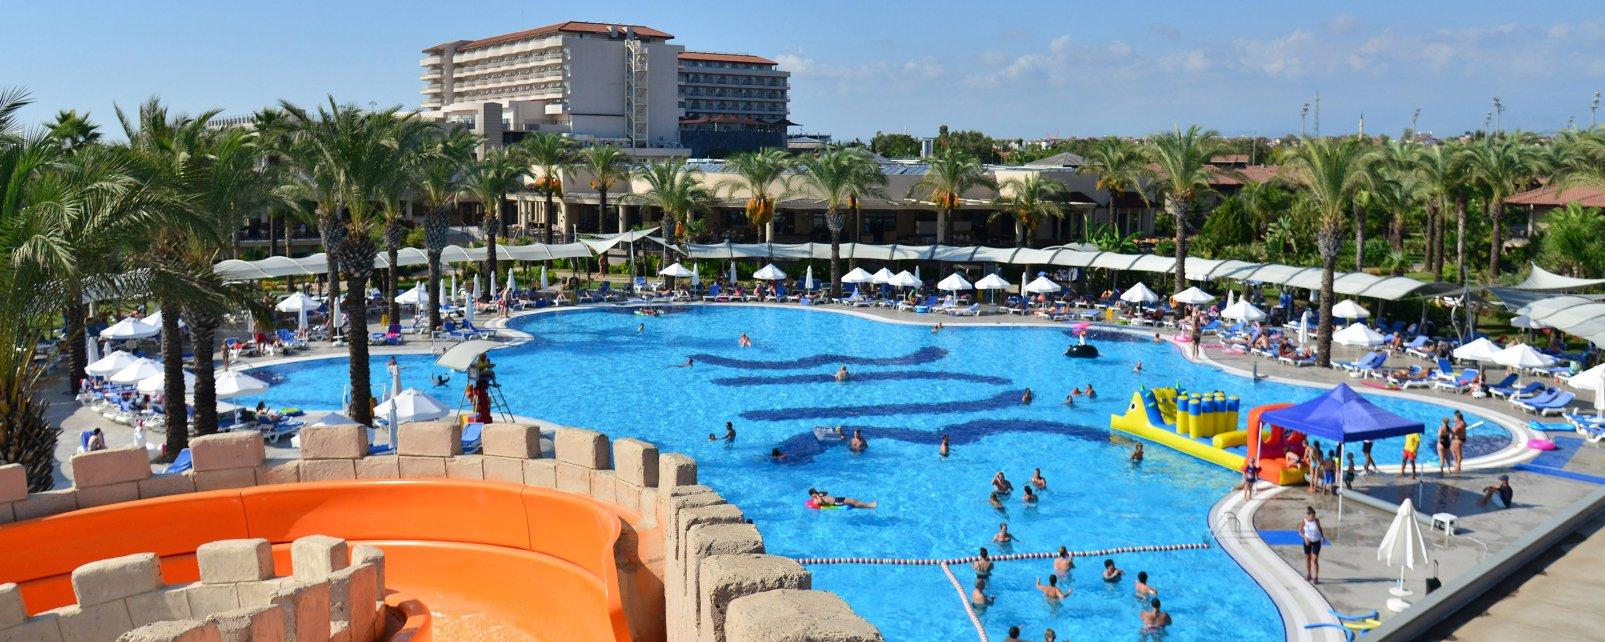 Hôtel TUI Blue Palm Garden